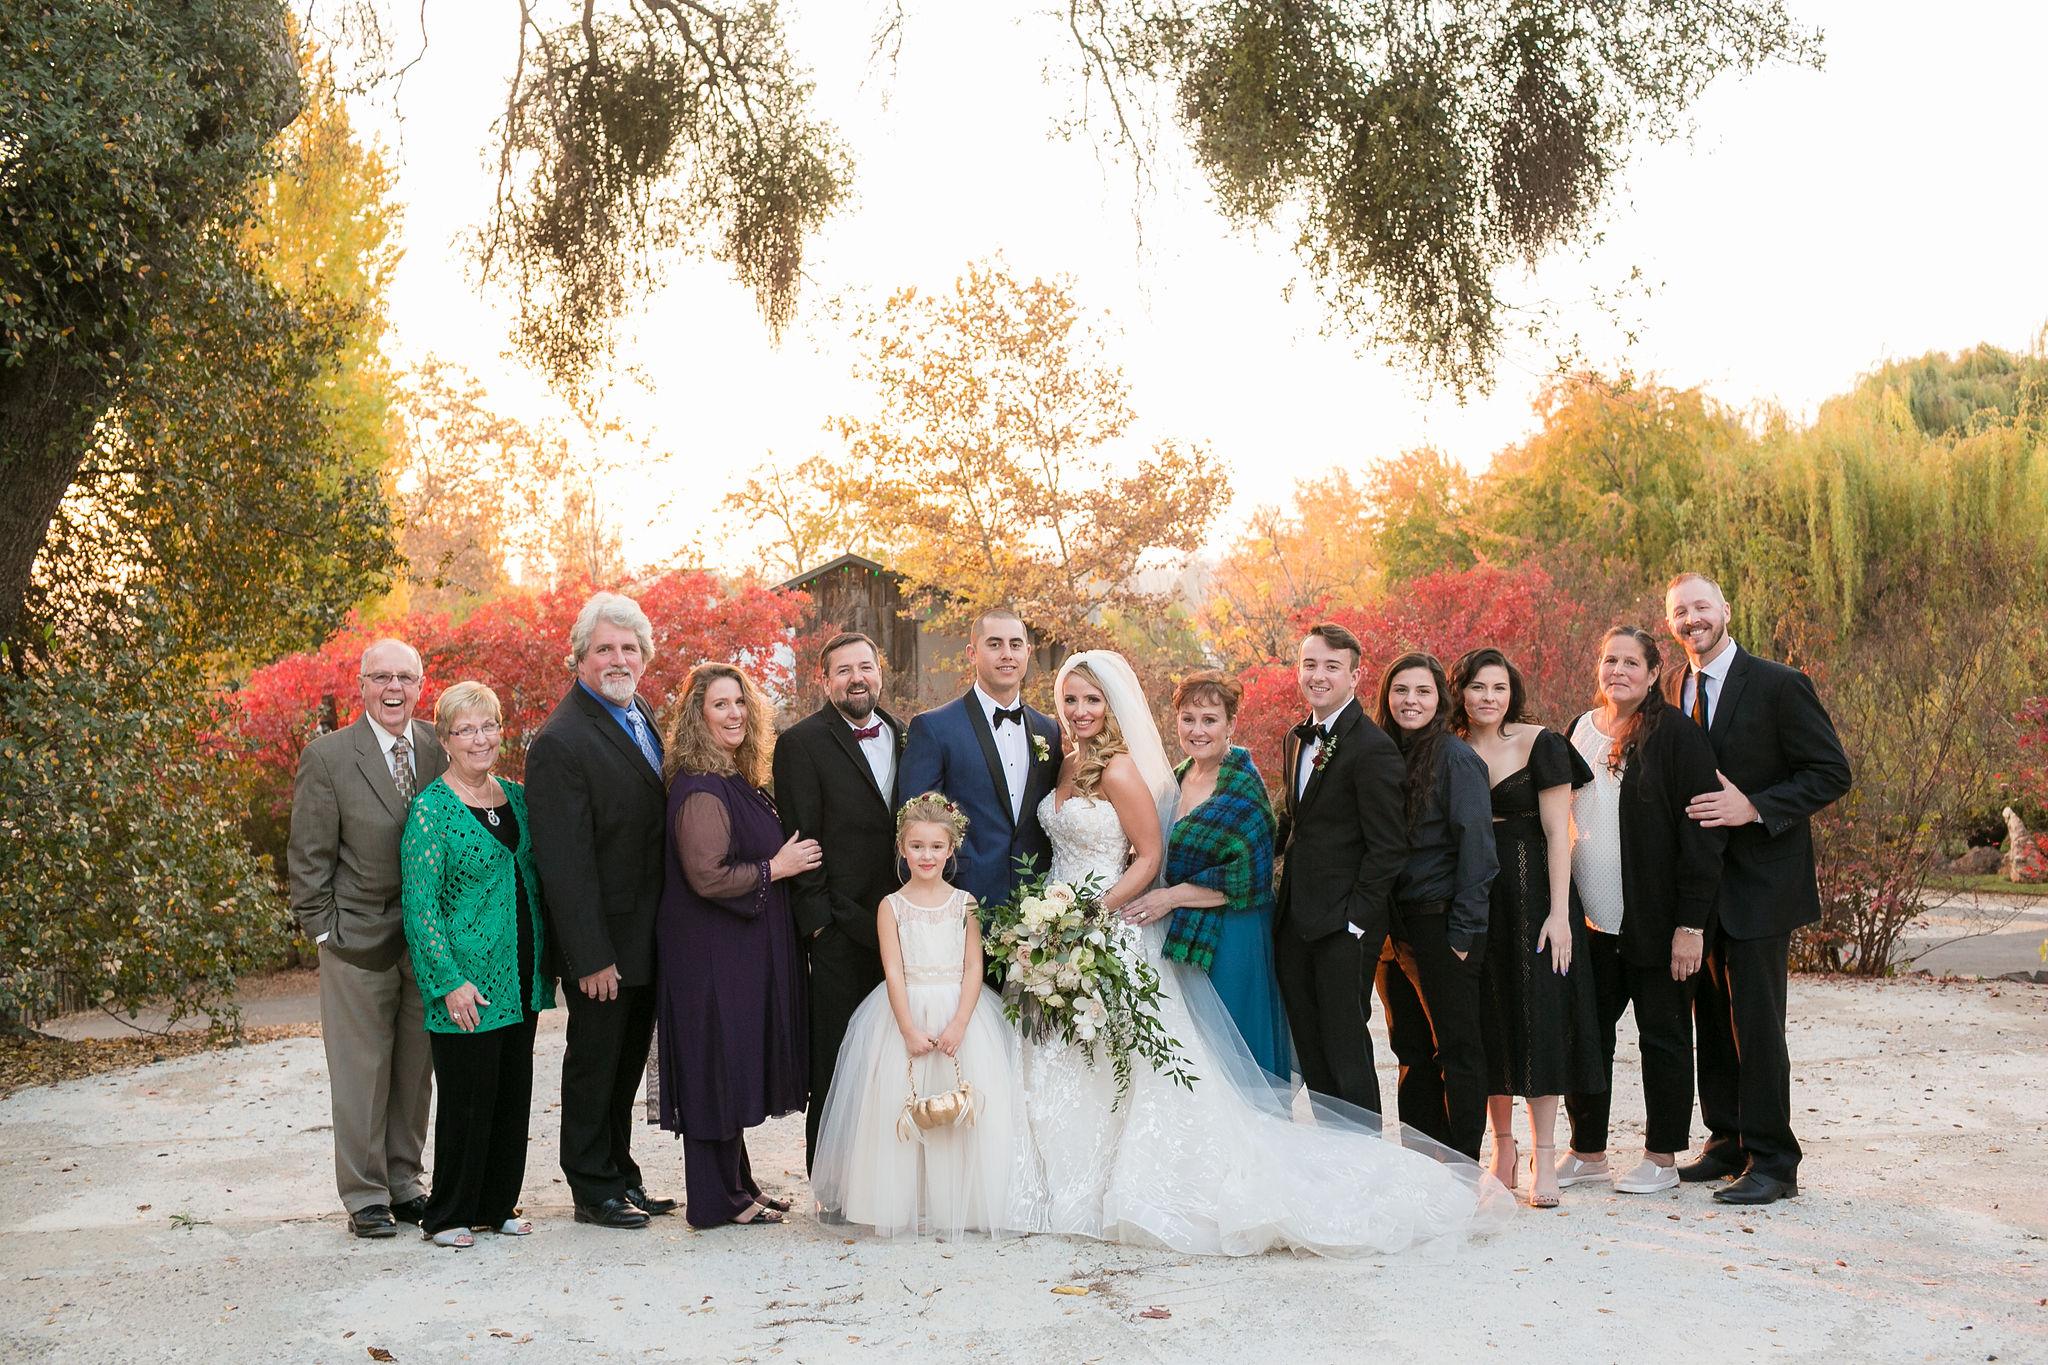 union hill inn sonora wedding-23.jpg